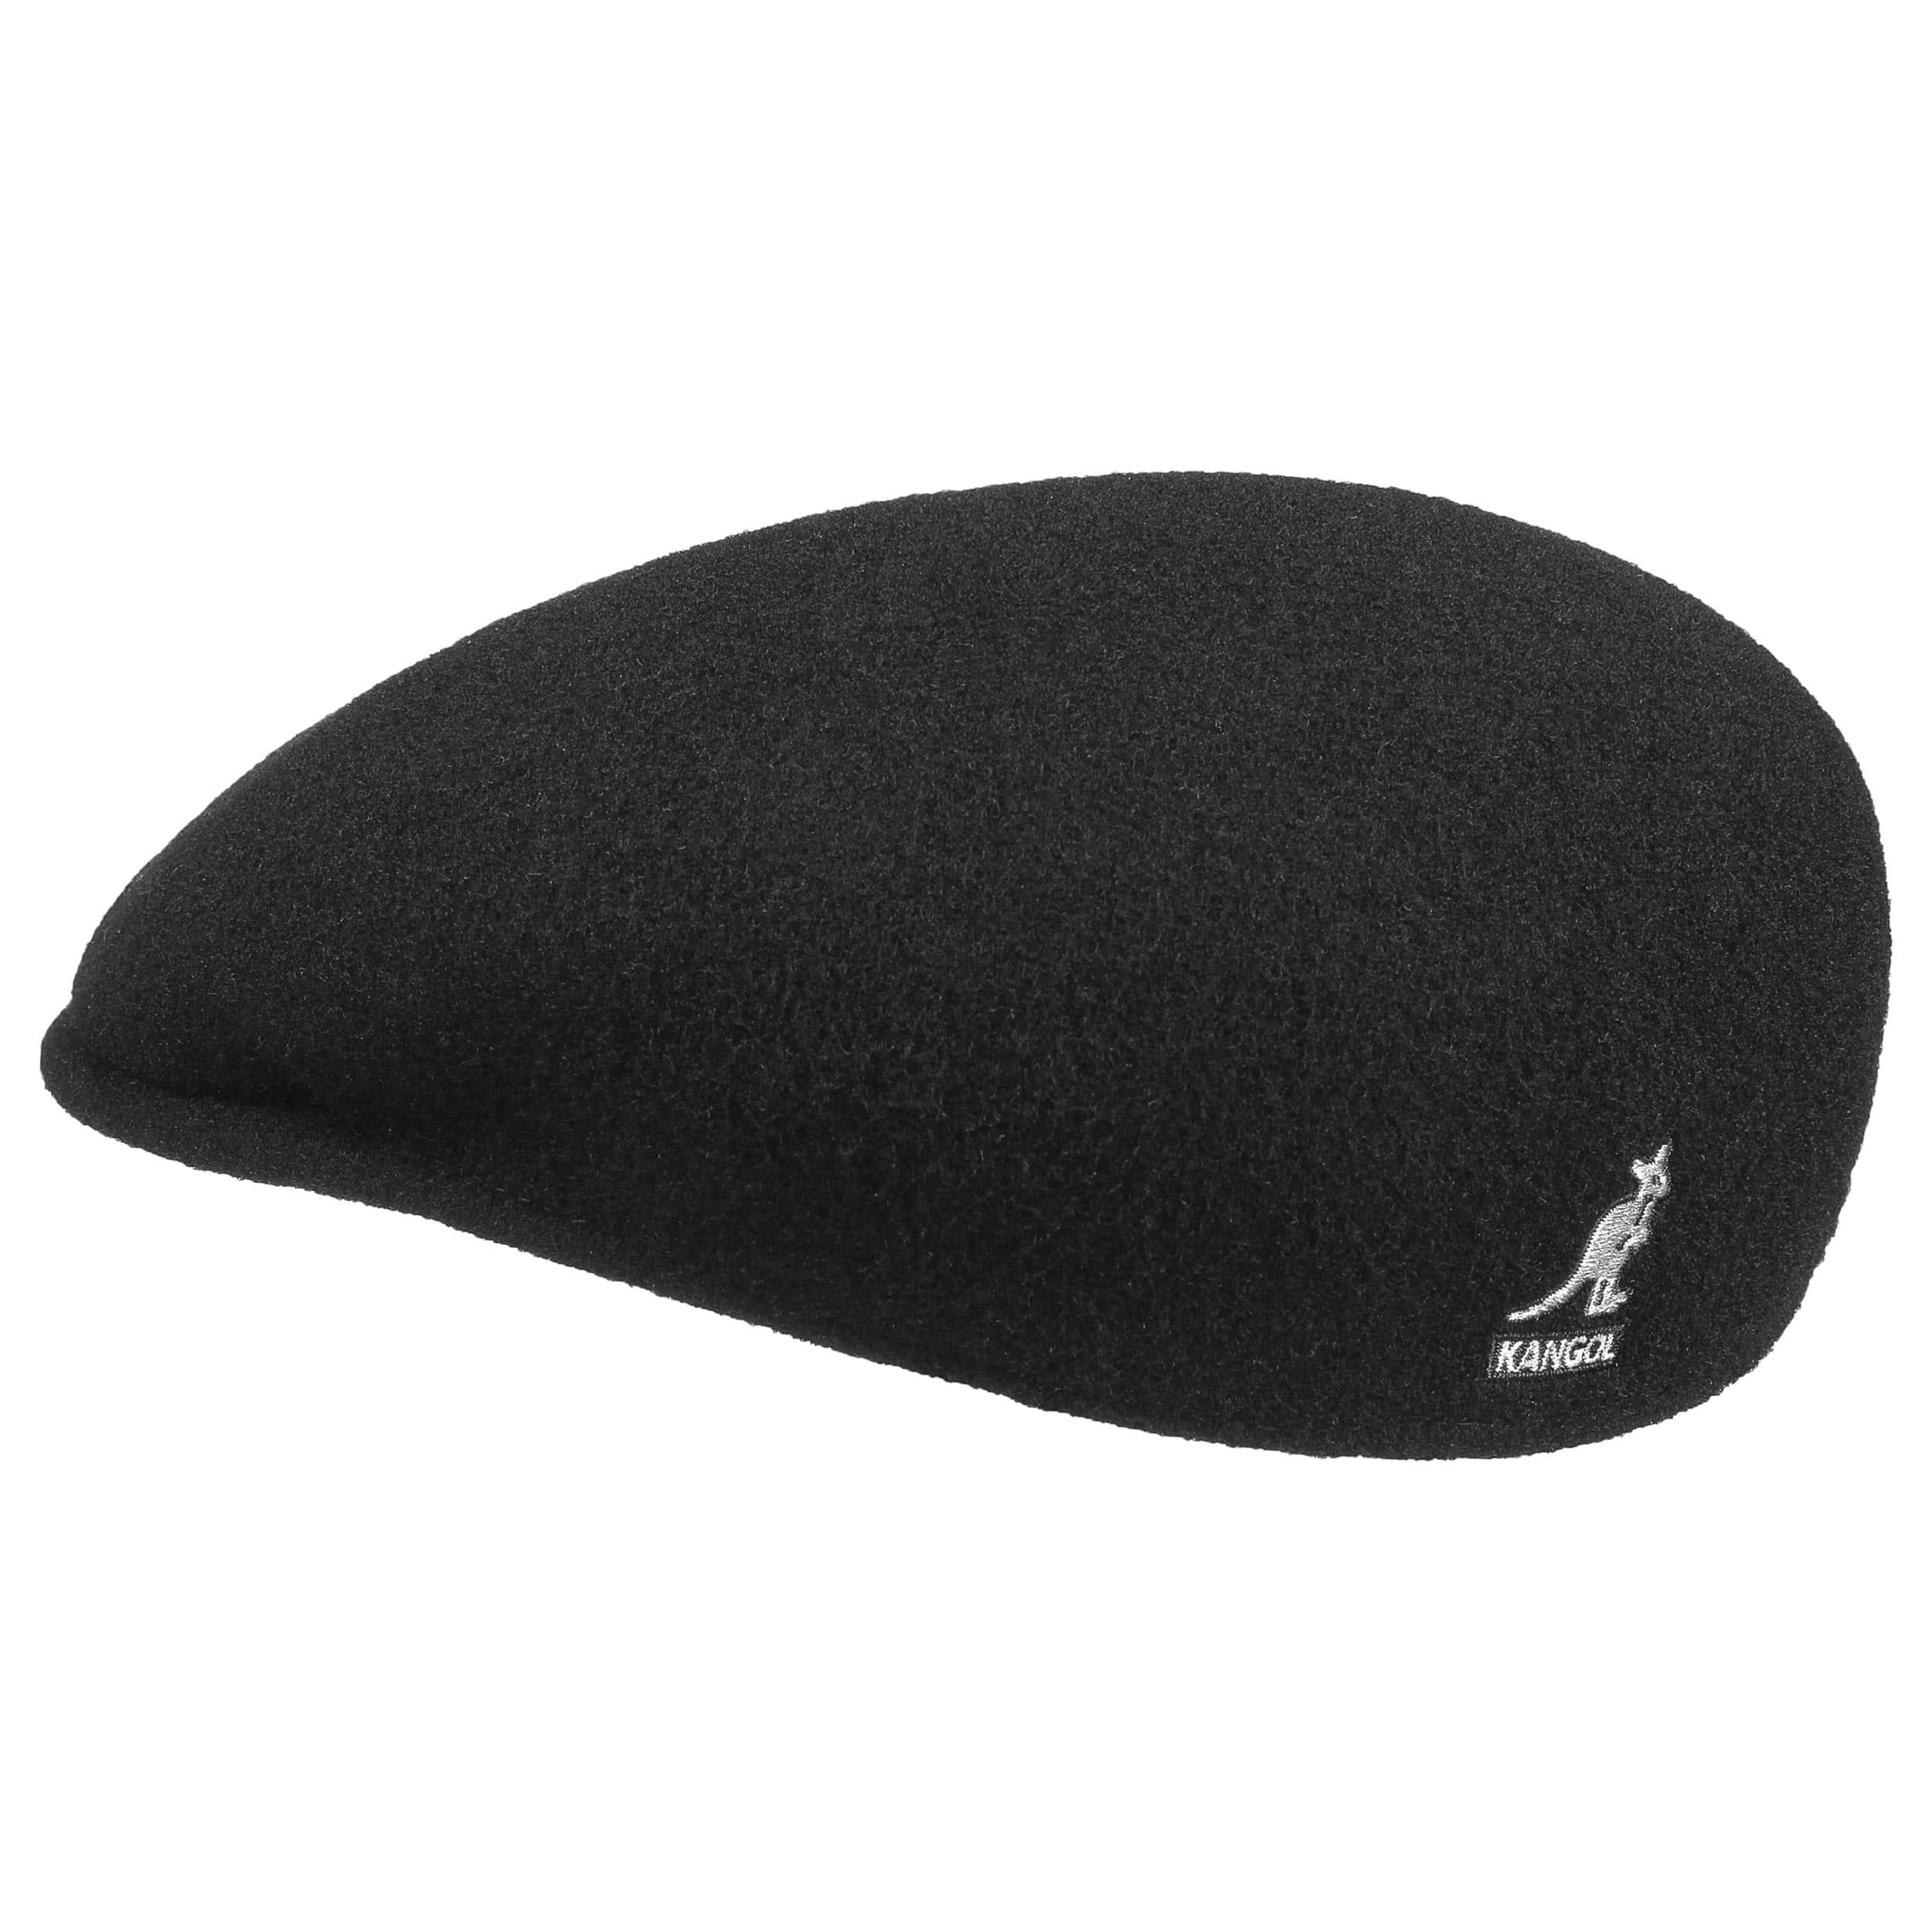 Kangol 504, EUR 39,95 --> Hats, caps & beanies shop online ...